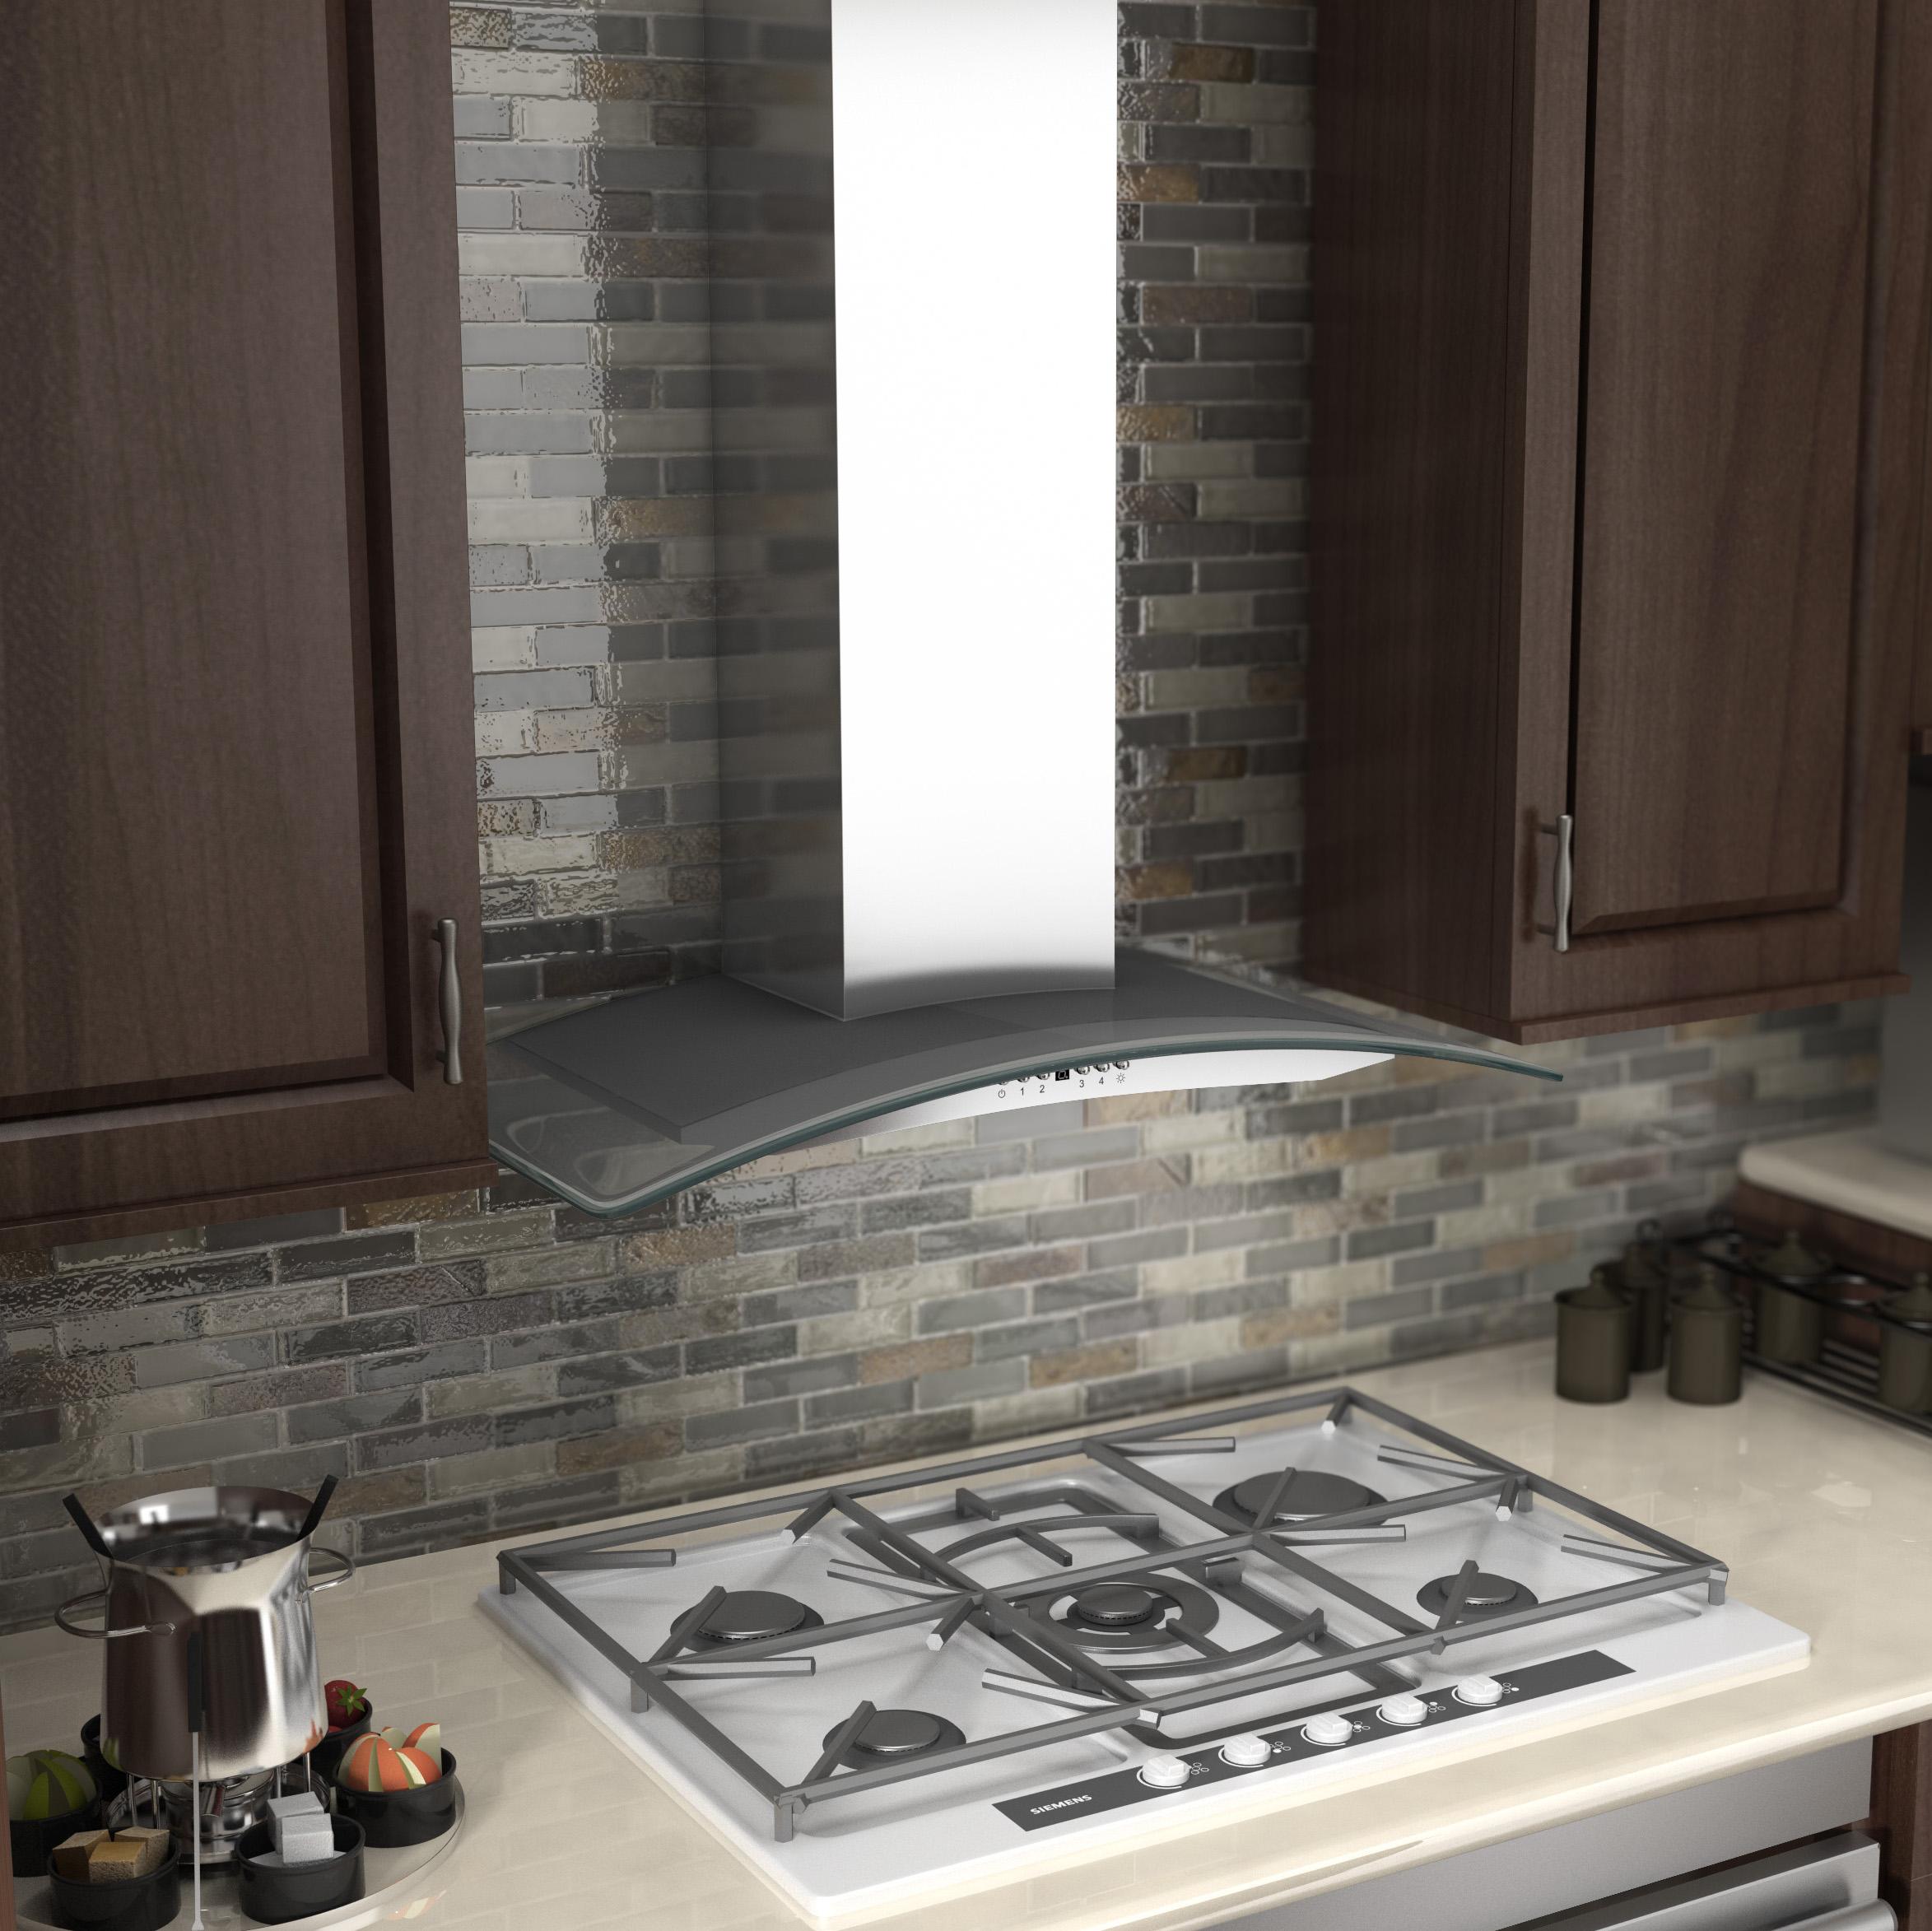 zline-stainless-steel-wall-mounted-range-hood-KN4-detail 1.jpg